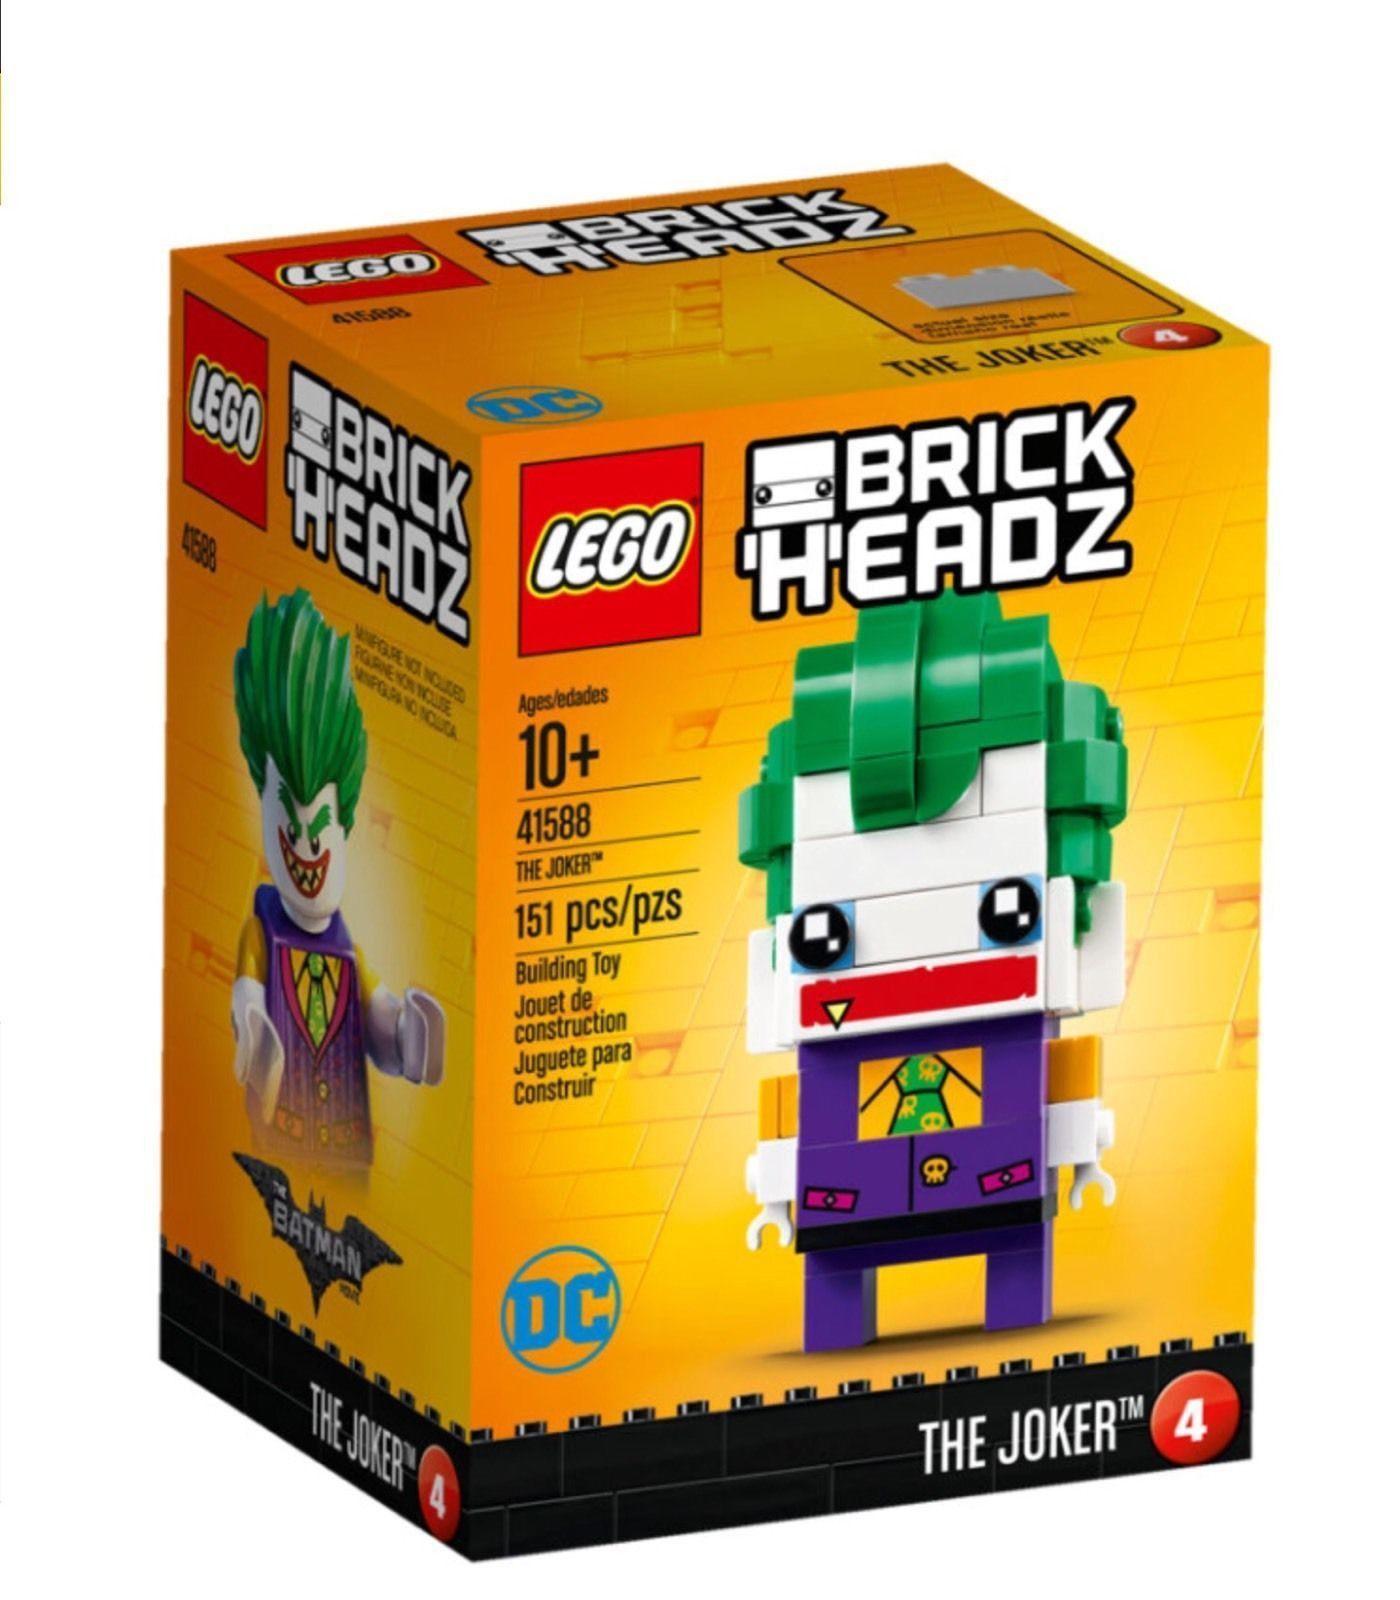 Lego 41588 brickheadz Le Joker Brand New Sealed Set